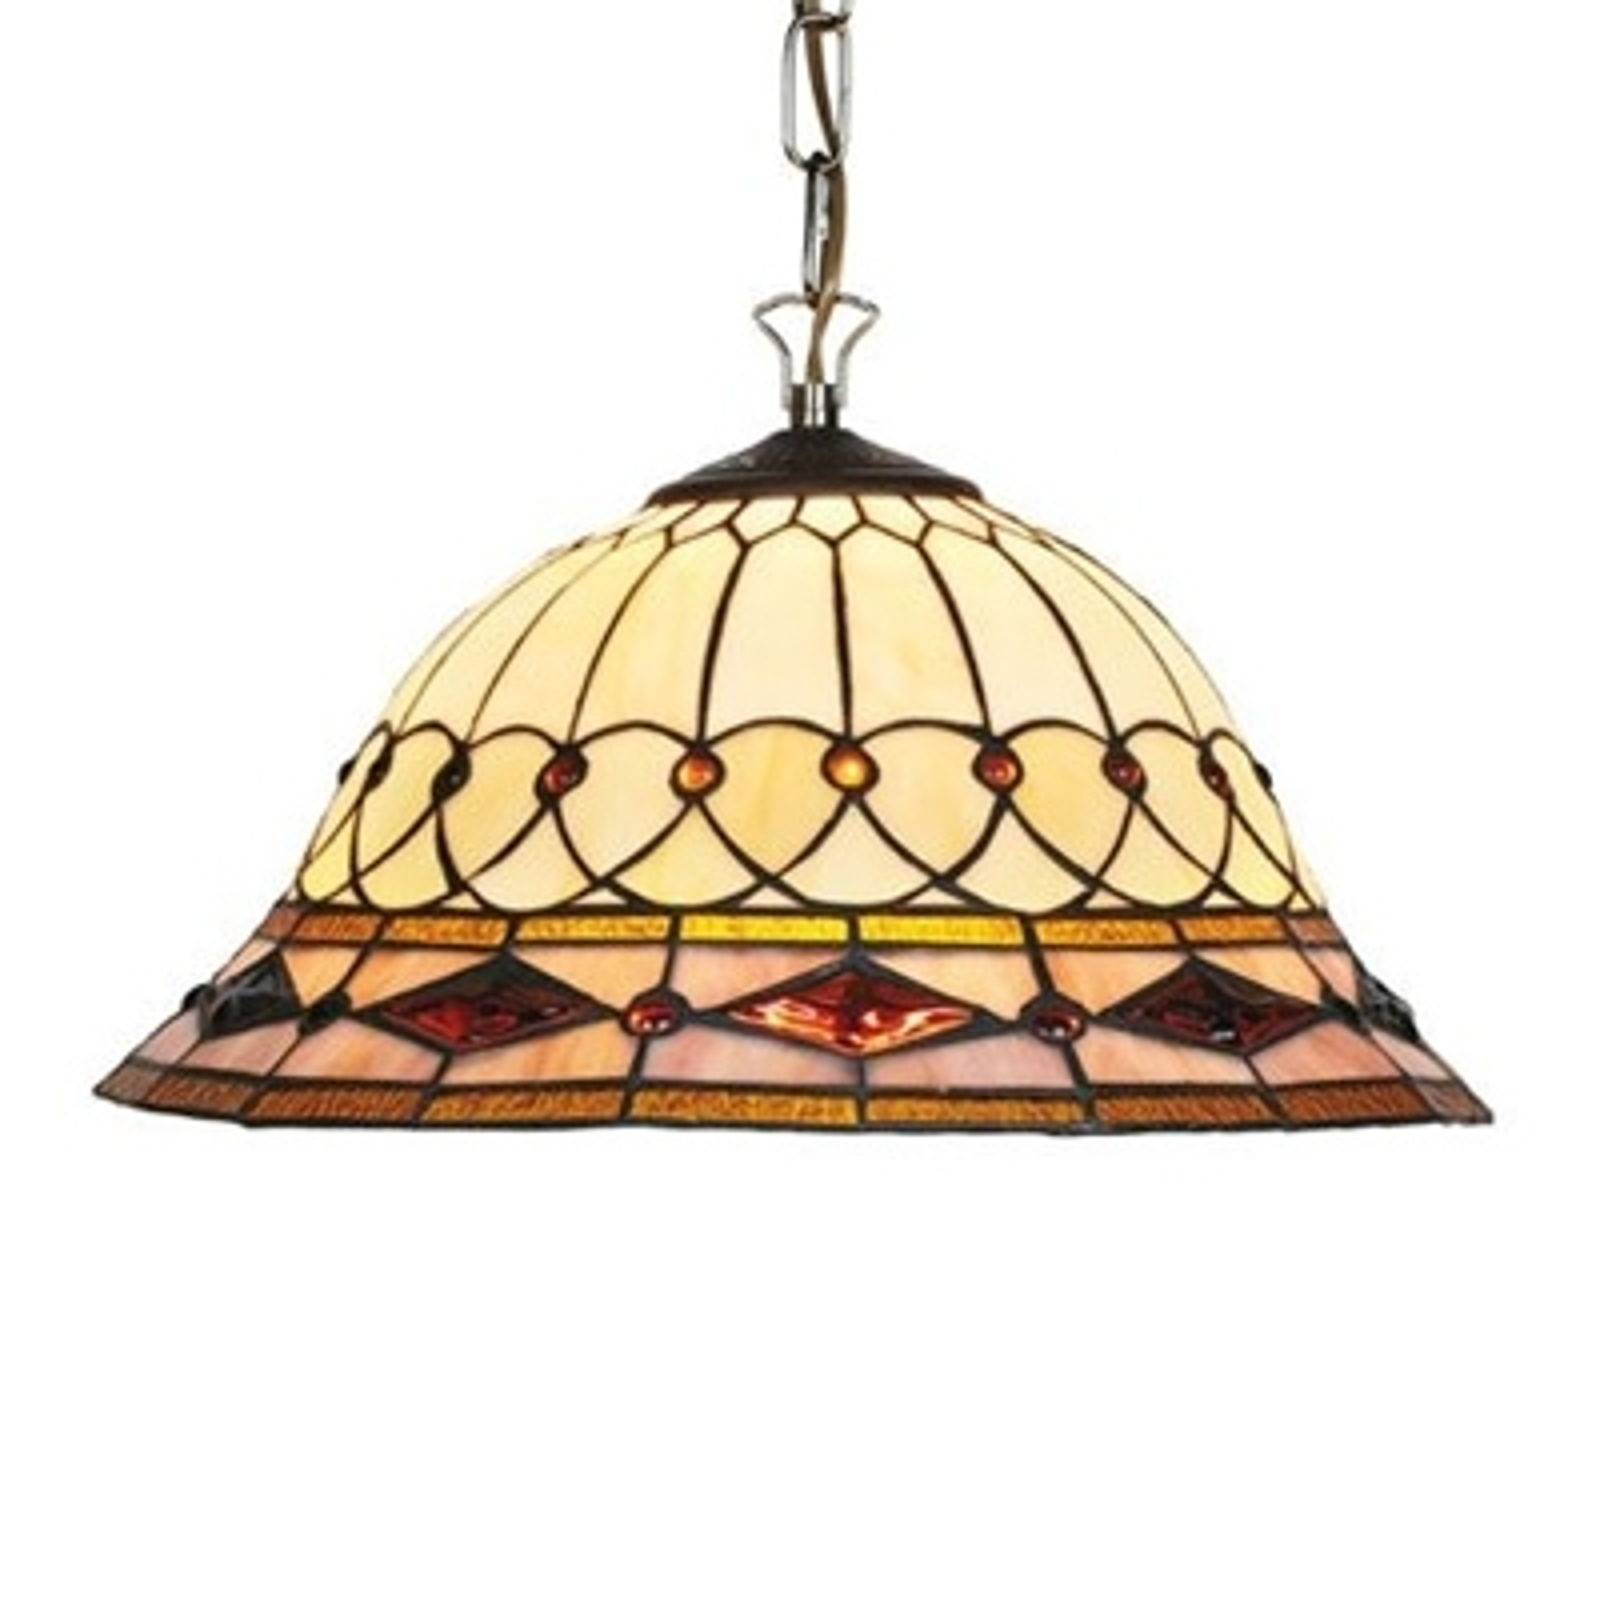 Hanglamp Kassandra in Tiffany-stijl 1-lichts